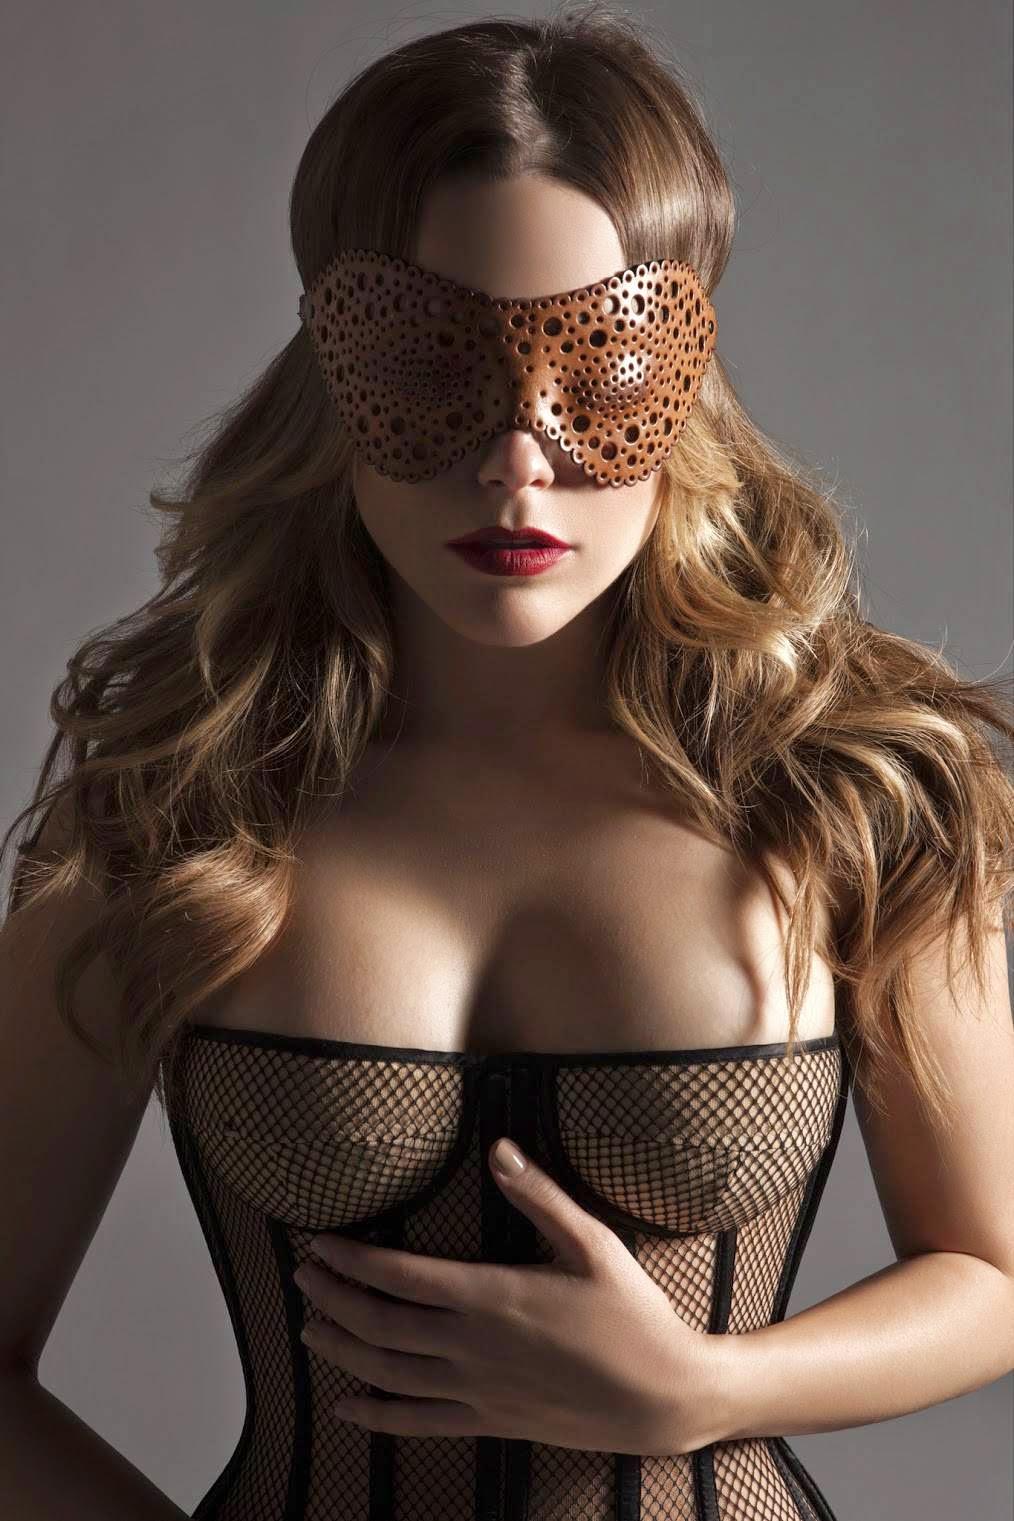 Sophia Bush Sexy Maxim Magazine Photoshoot